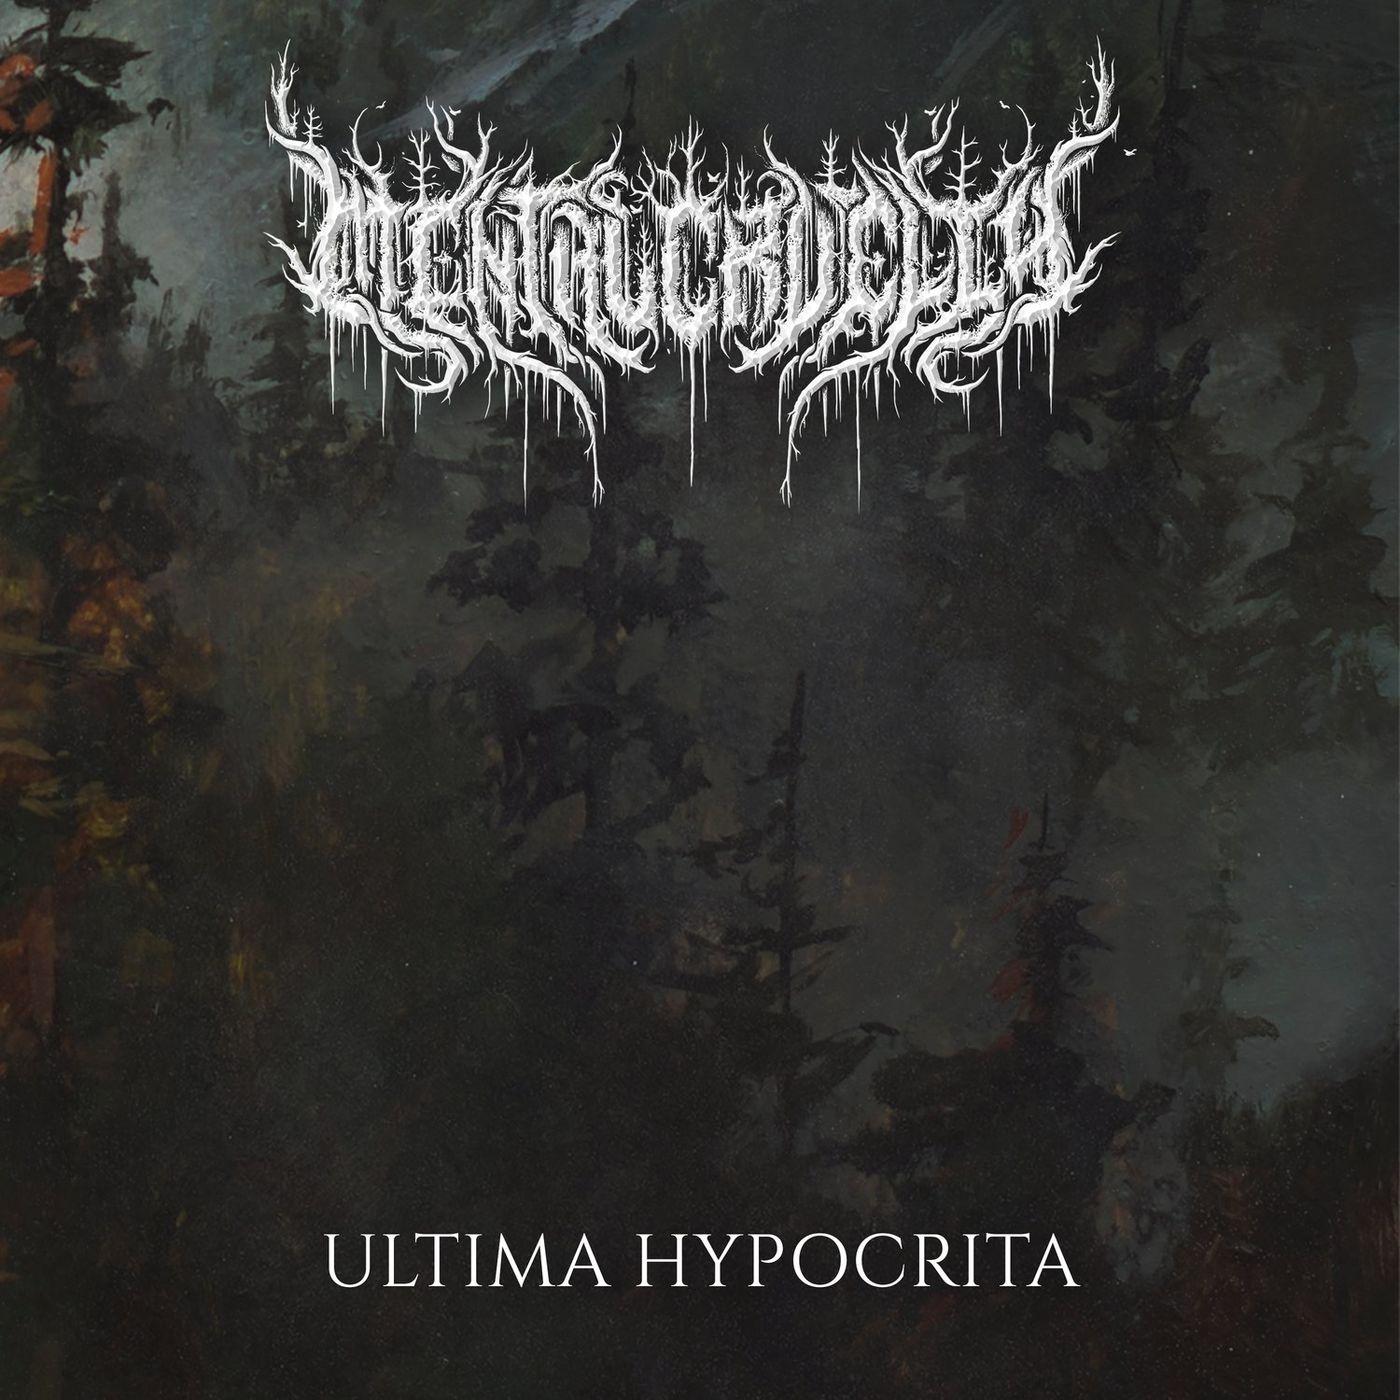 Mental Cruelty - Ultima Hypocrita [single] (2021)